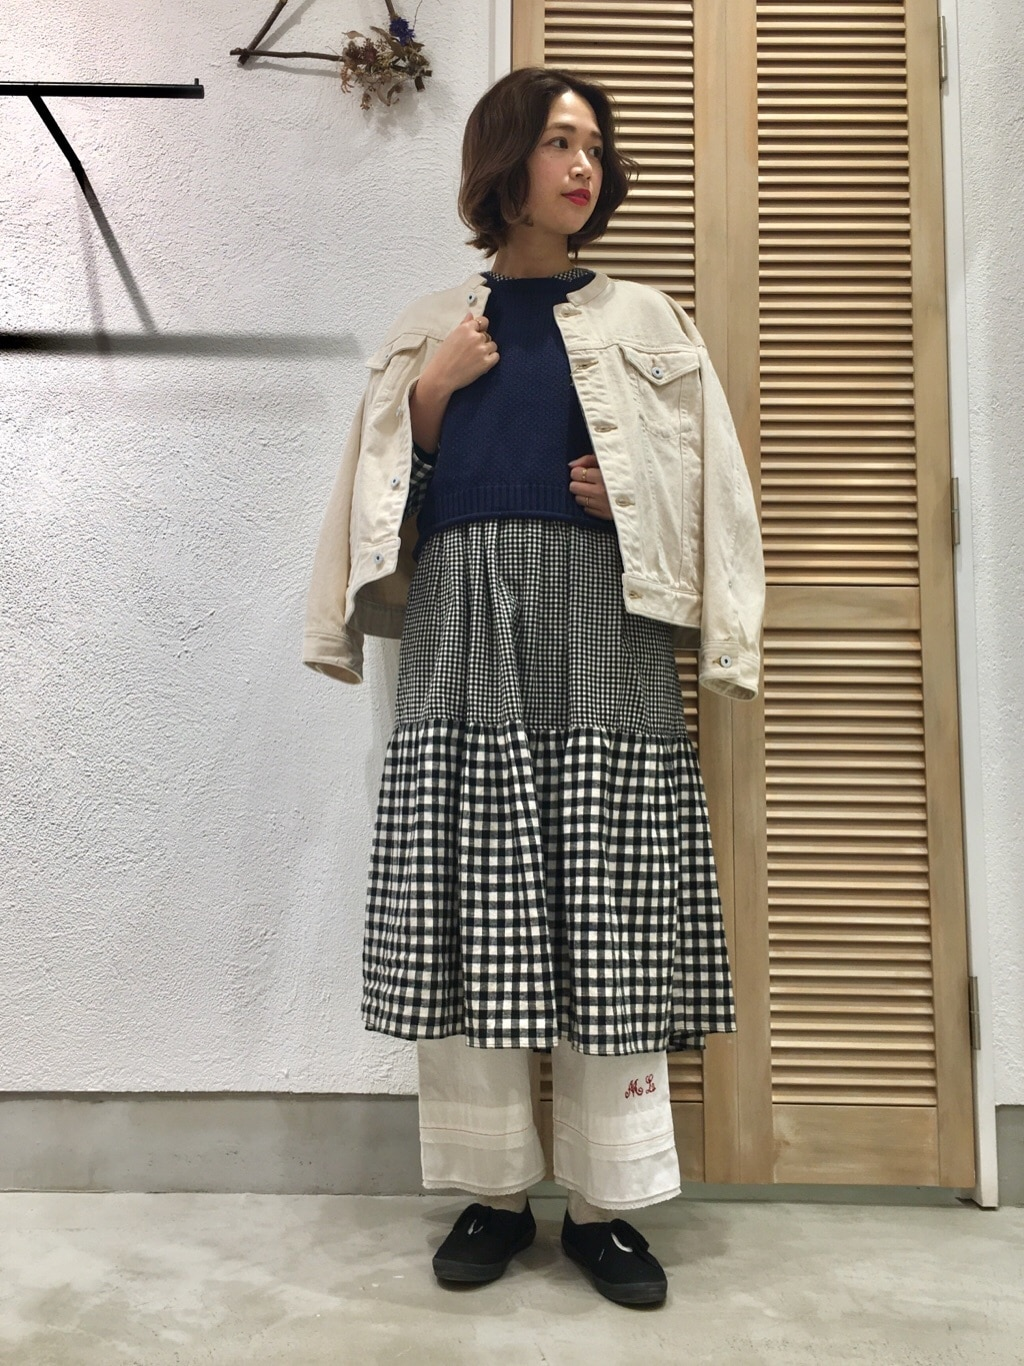 chambre de charme 横浜ジョイナス 身長:160cm 2021.02.10